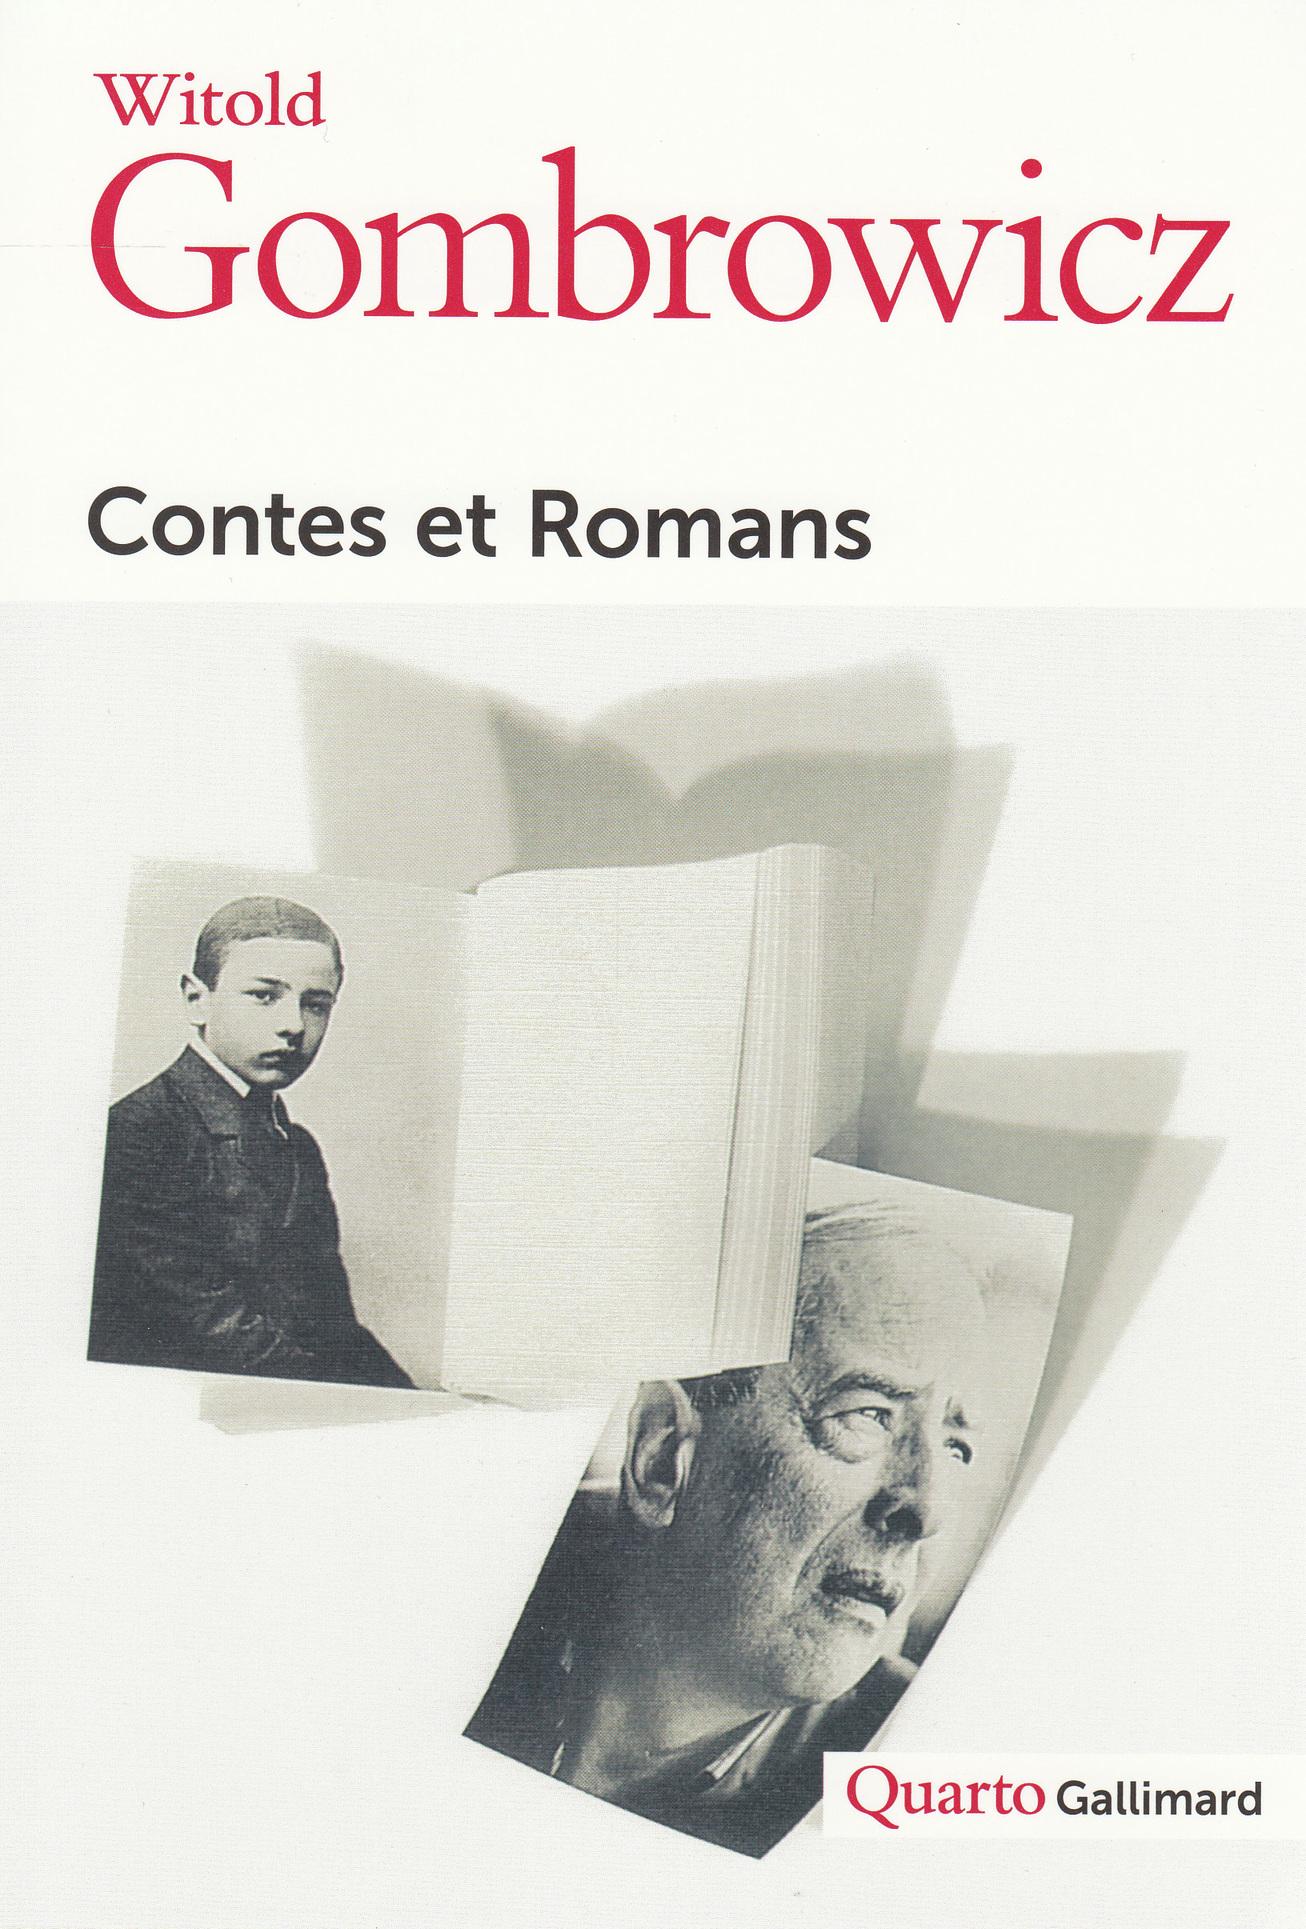 W. Gombrovicz, Contes et Romans (coll. Quarto)